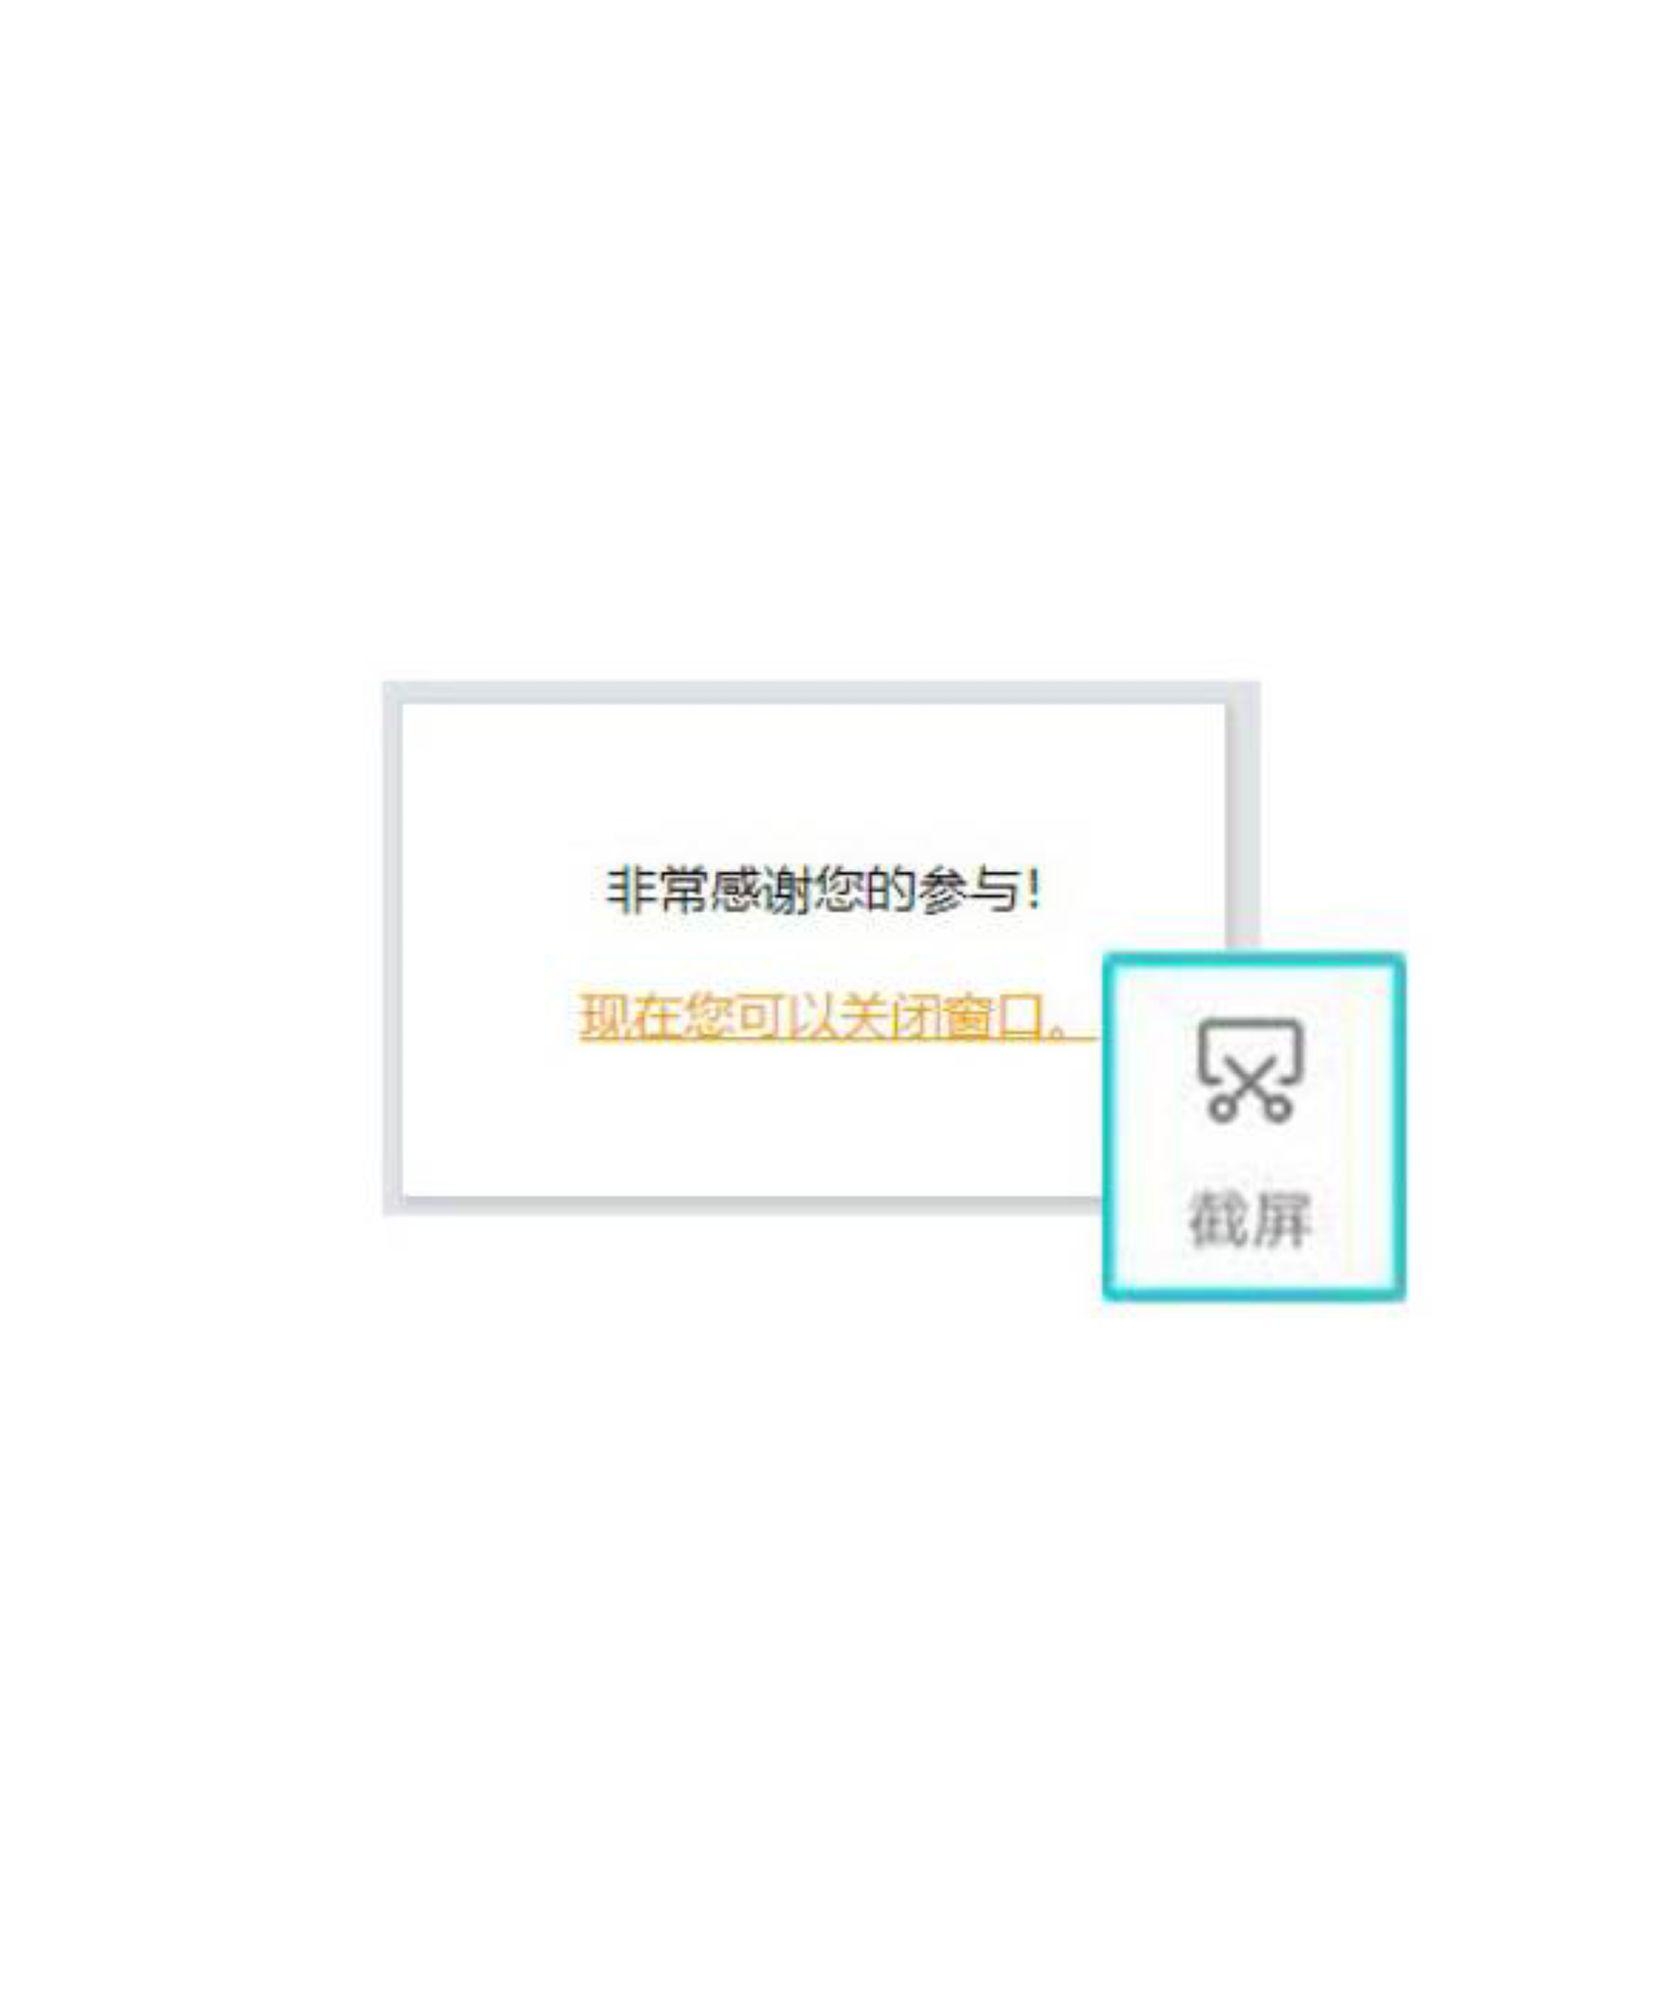 CN_20210205_HVACR_fluegas-survey_POSIM02.jpg